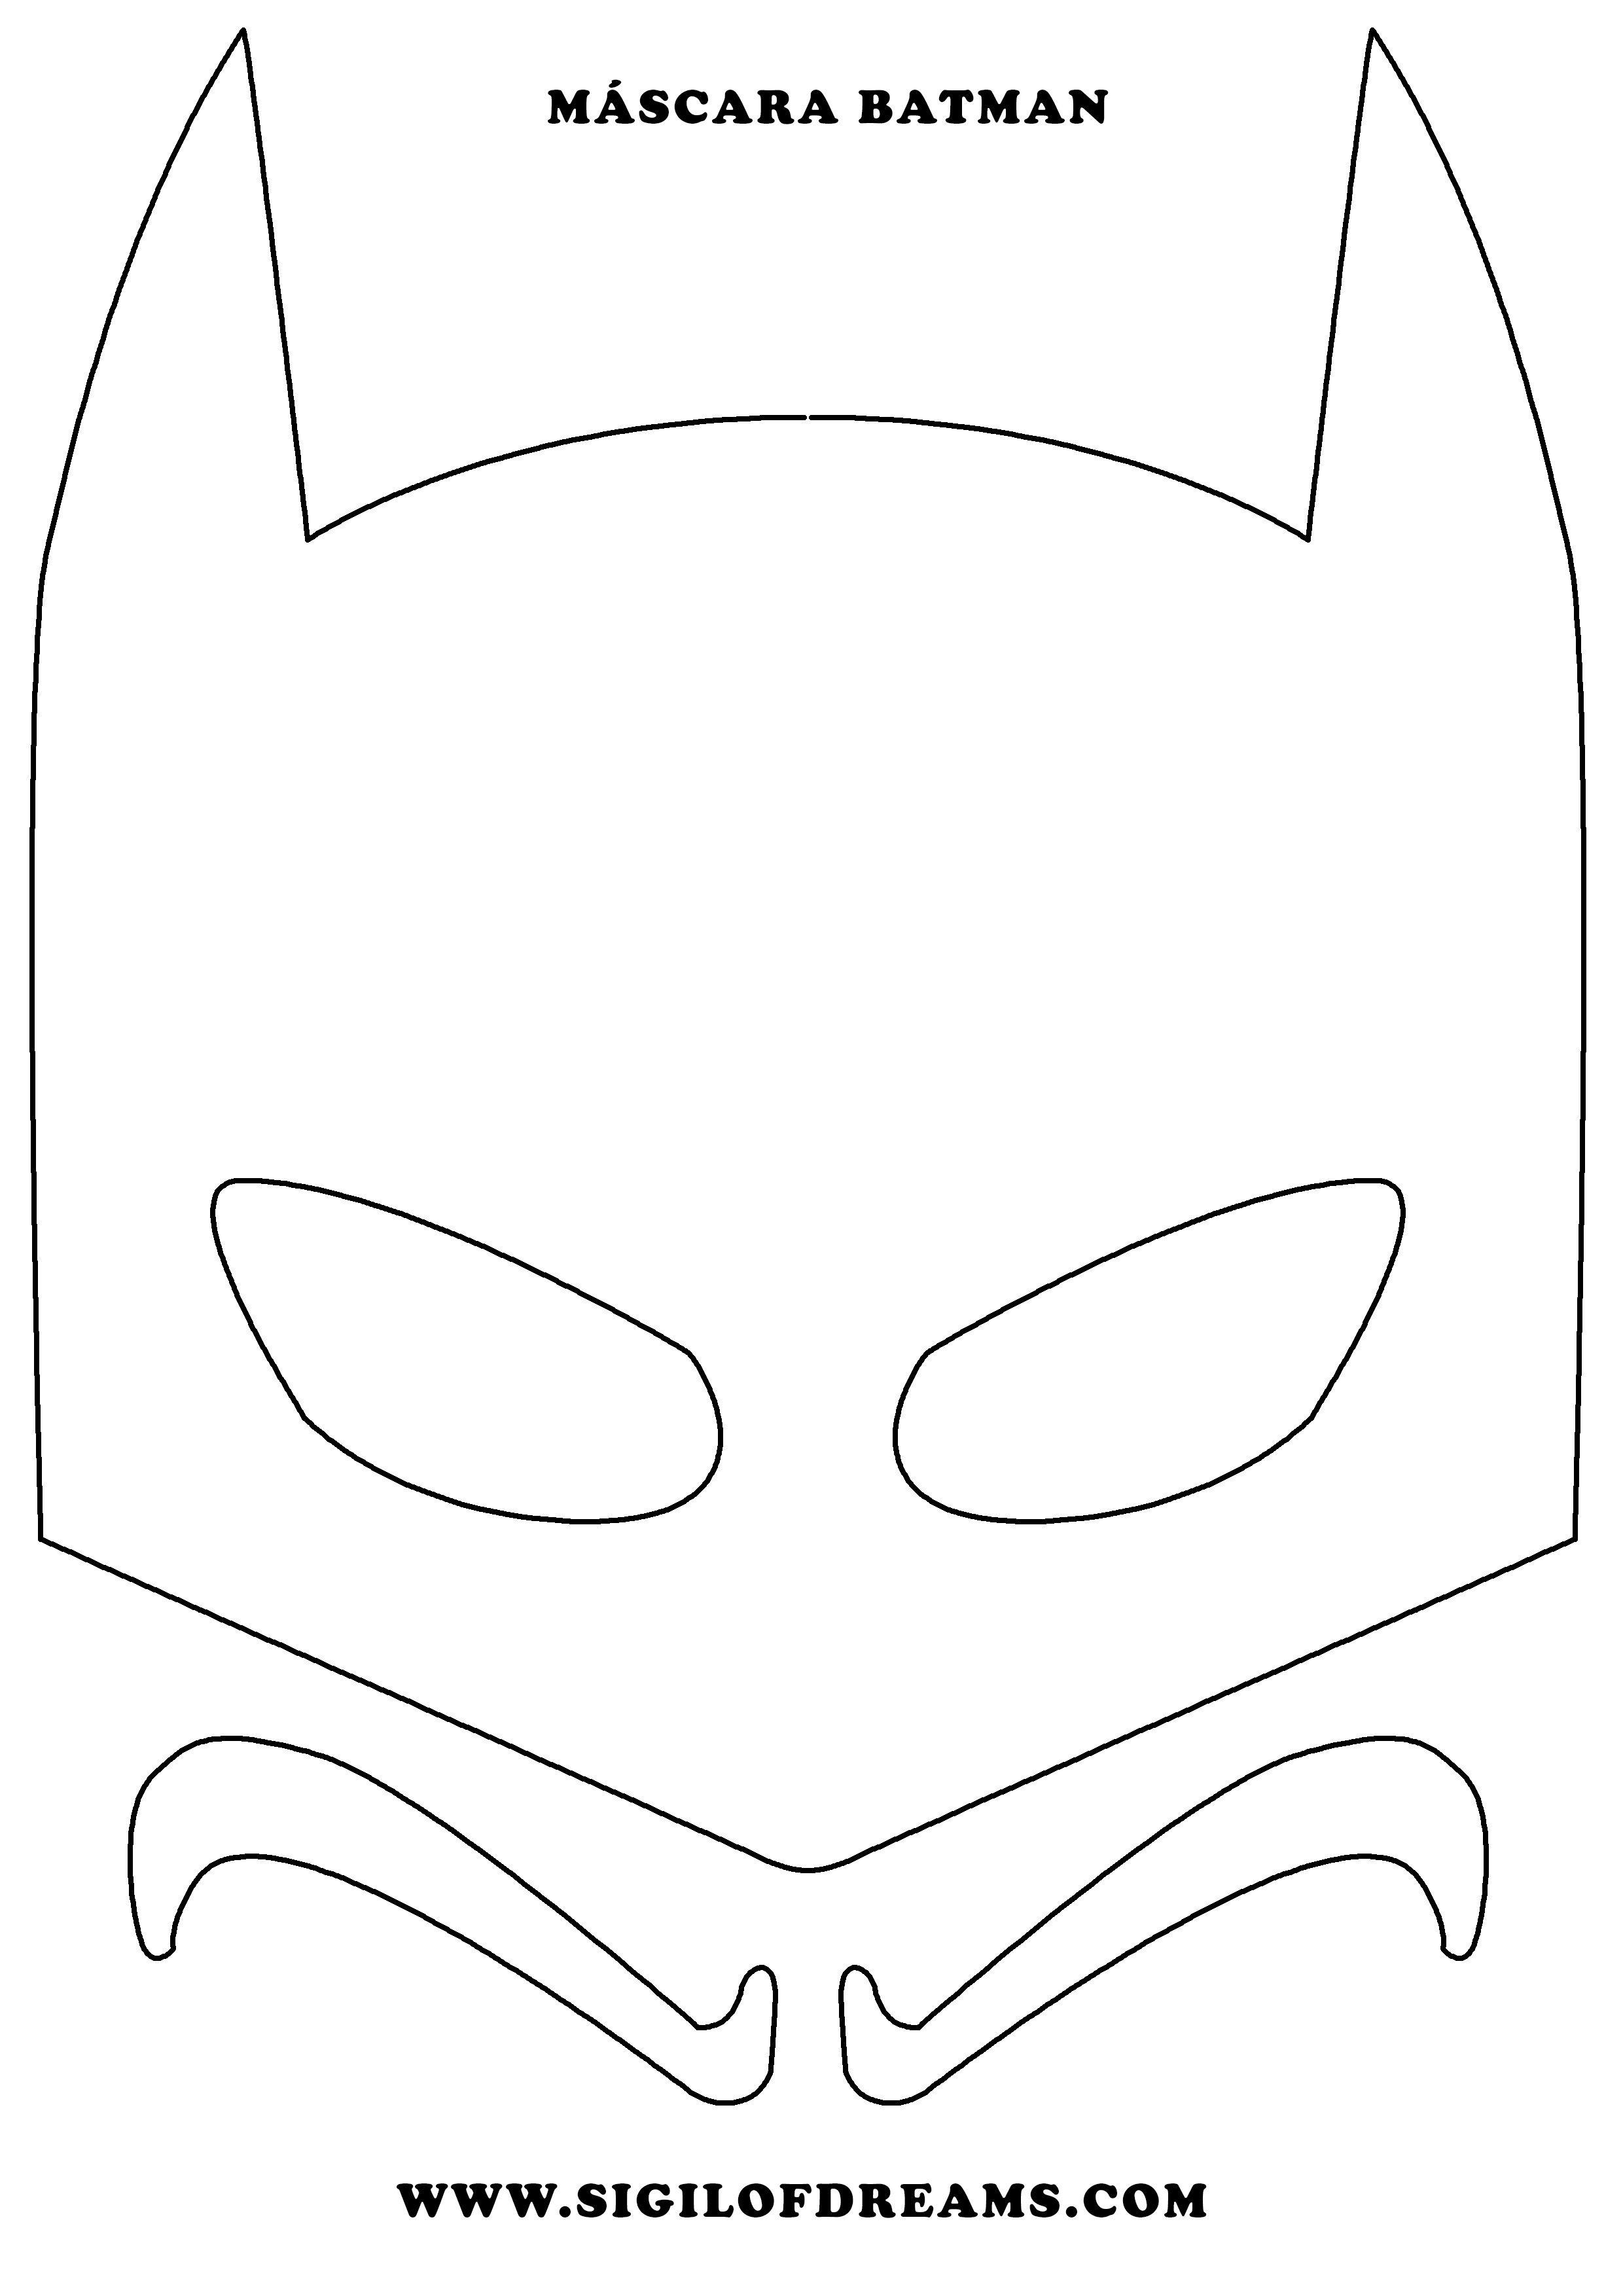 Máscara Batman para imprimir. #Mask #máscara #Batman #superheroe ...